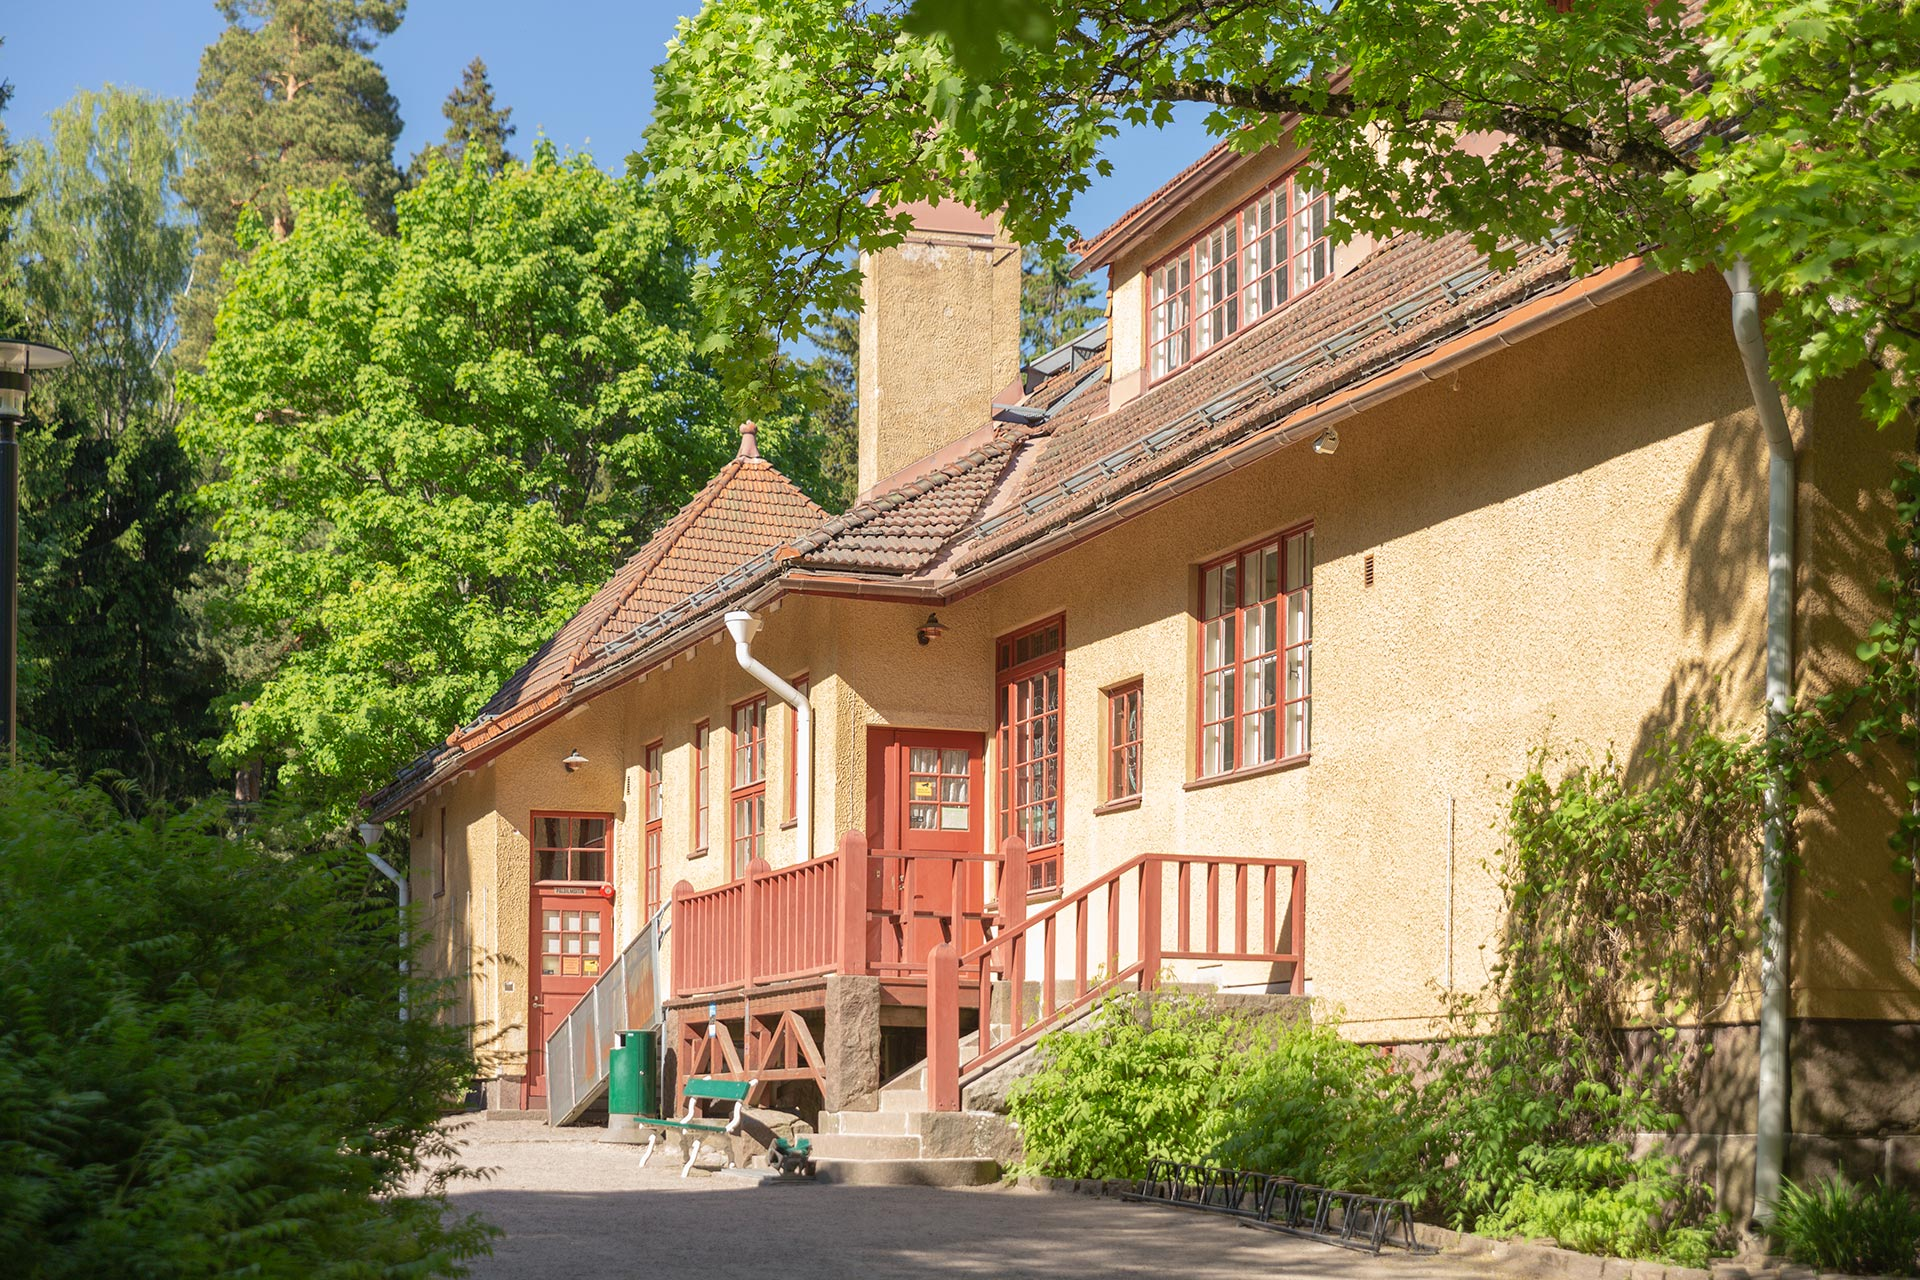 Villa Elfik © Tuulia Kolehmainen